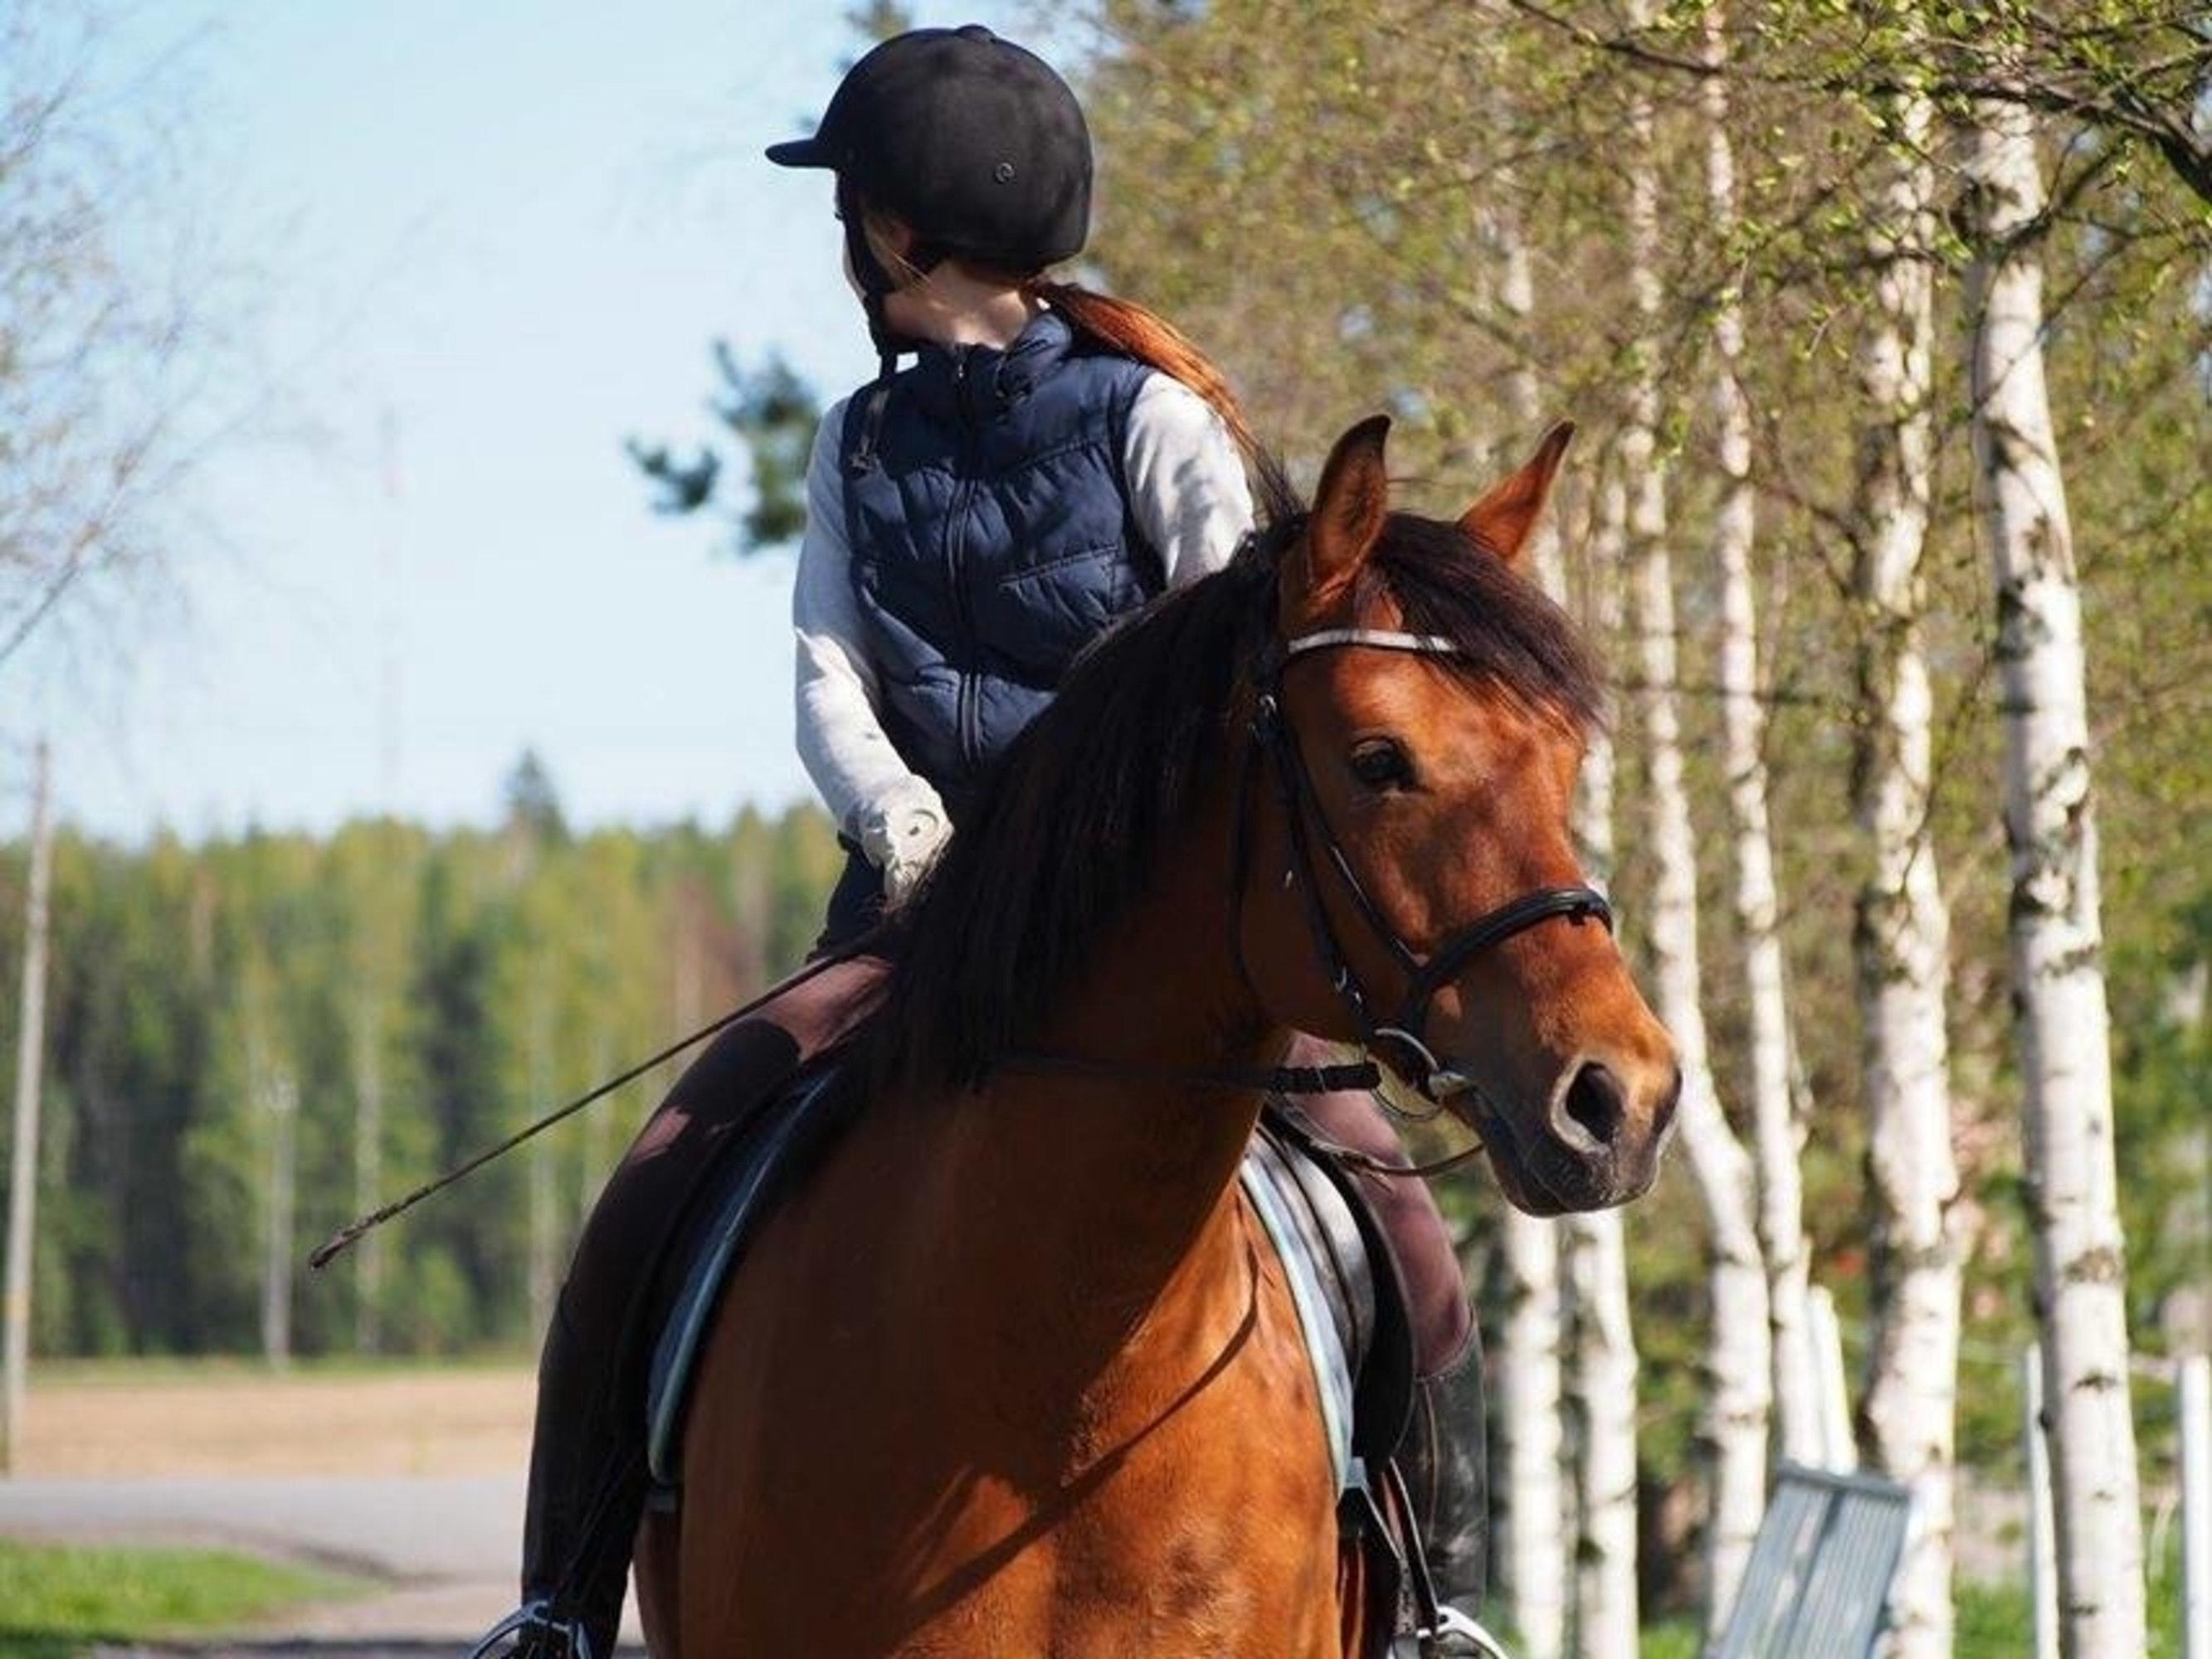 animal-brown-equestrian-2440349